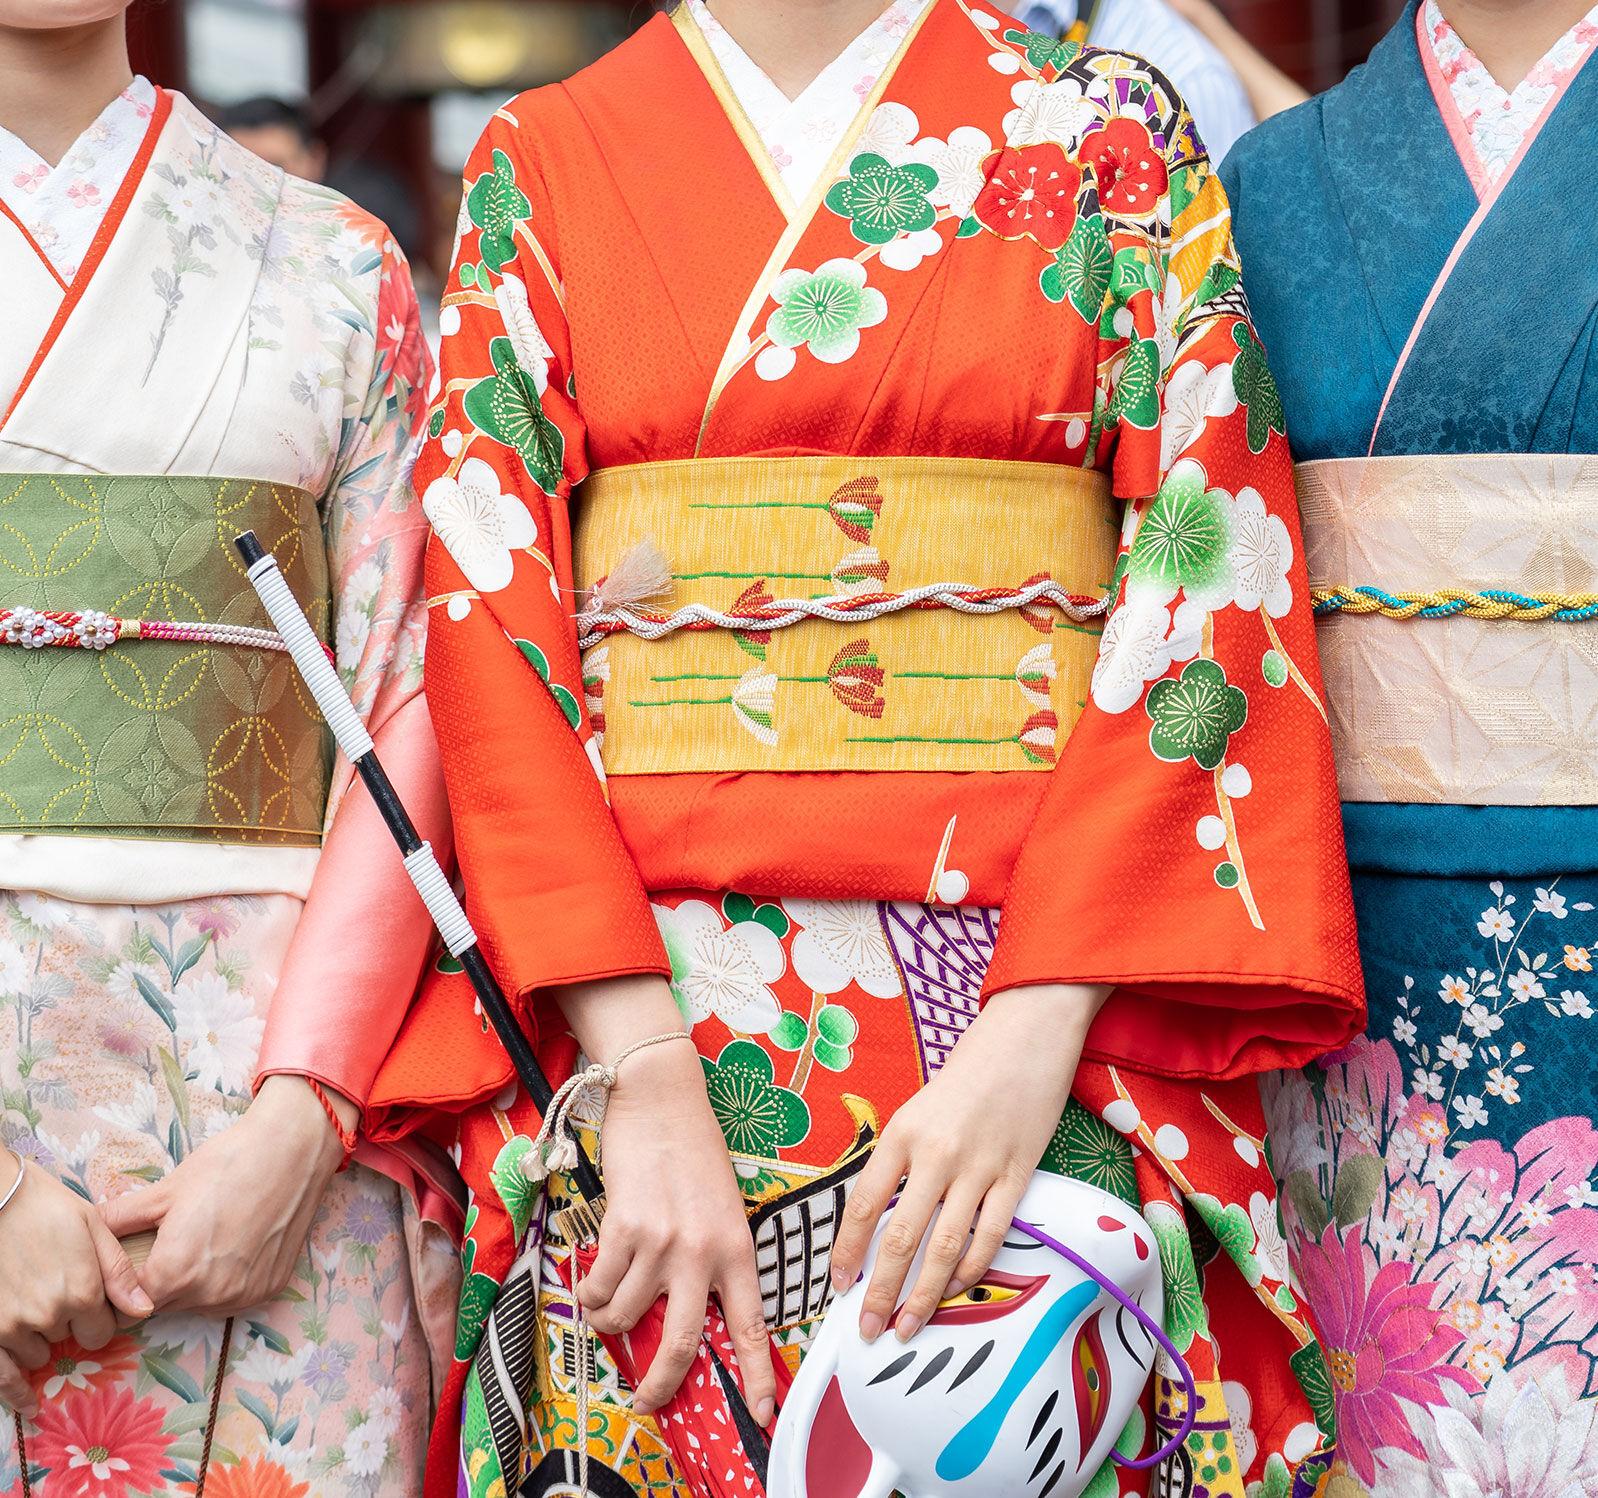 Frauen in traditionellen Kimonos